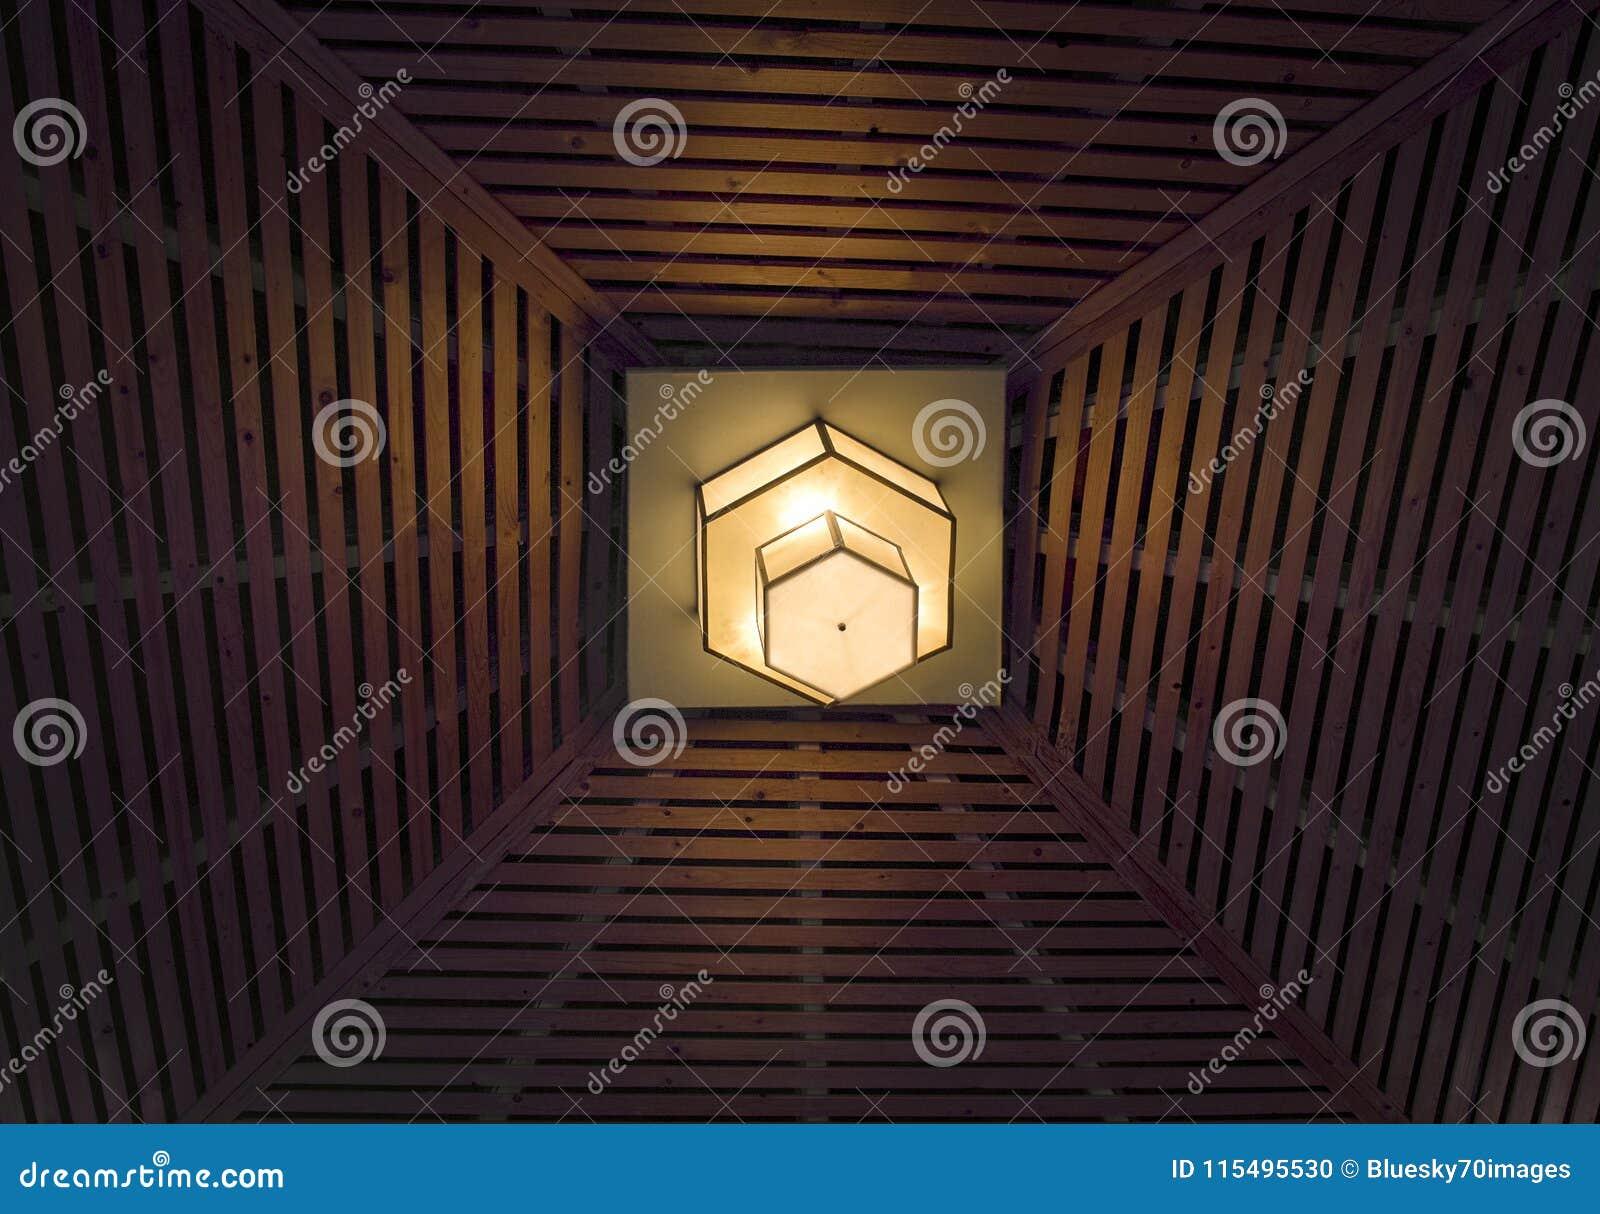 Polygonal Design Lamp Glowing On Kiosk Ceiling Stock Photo